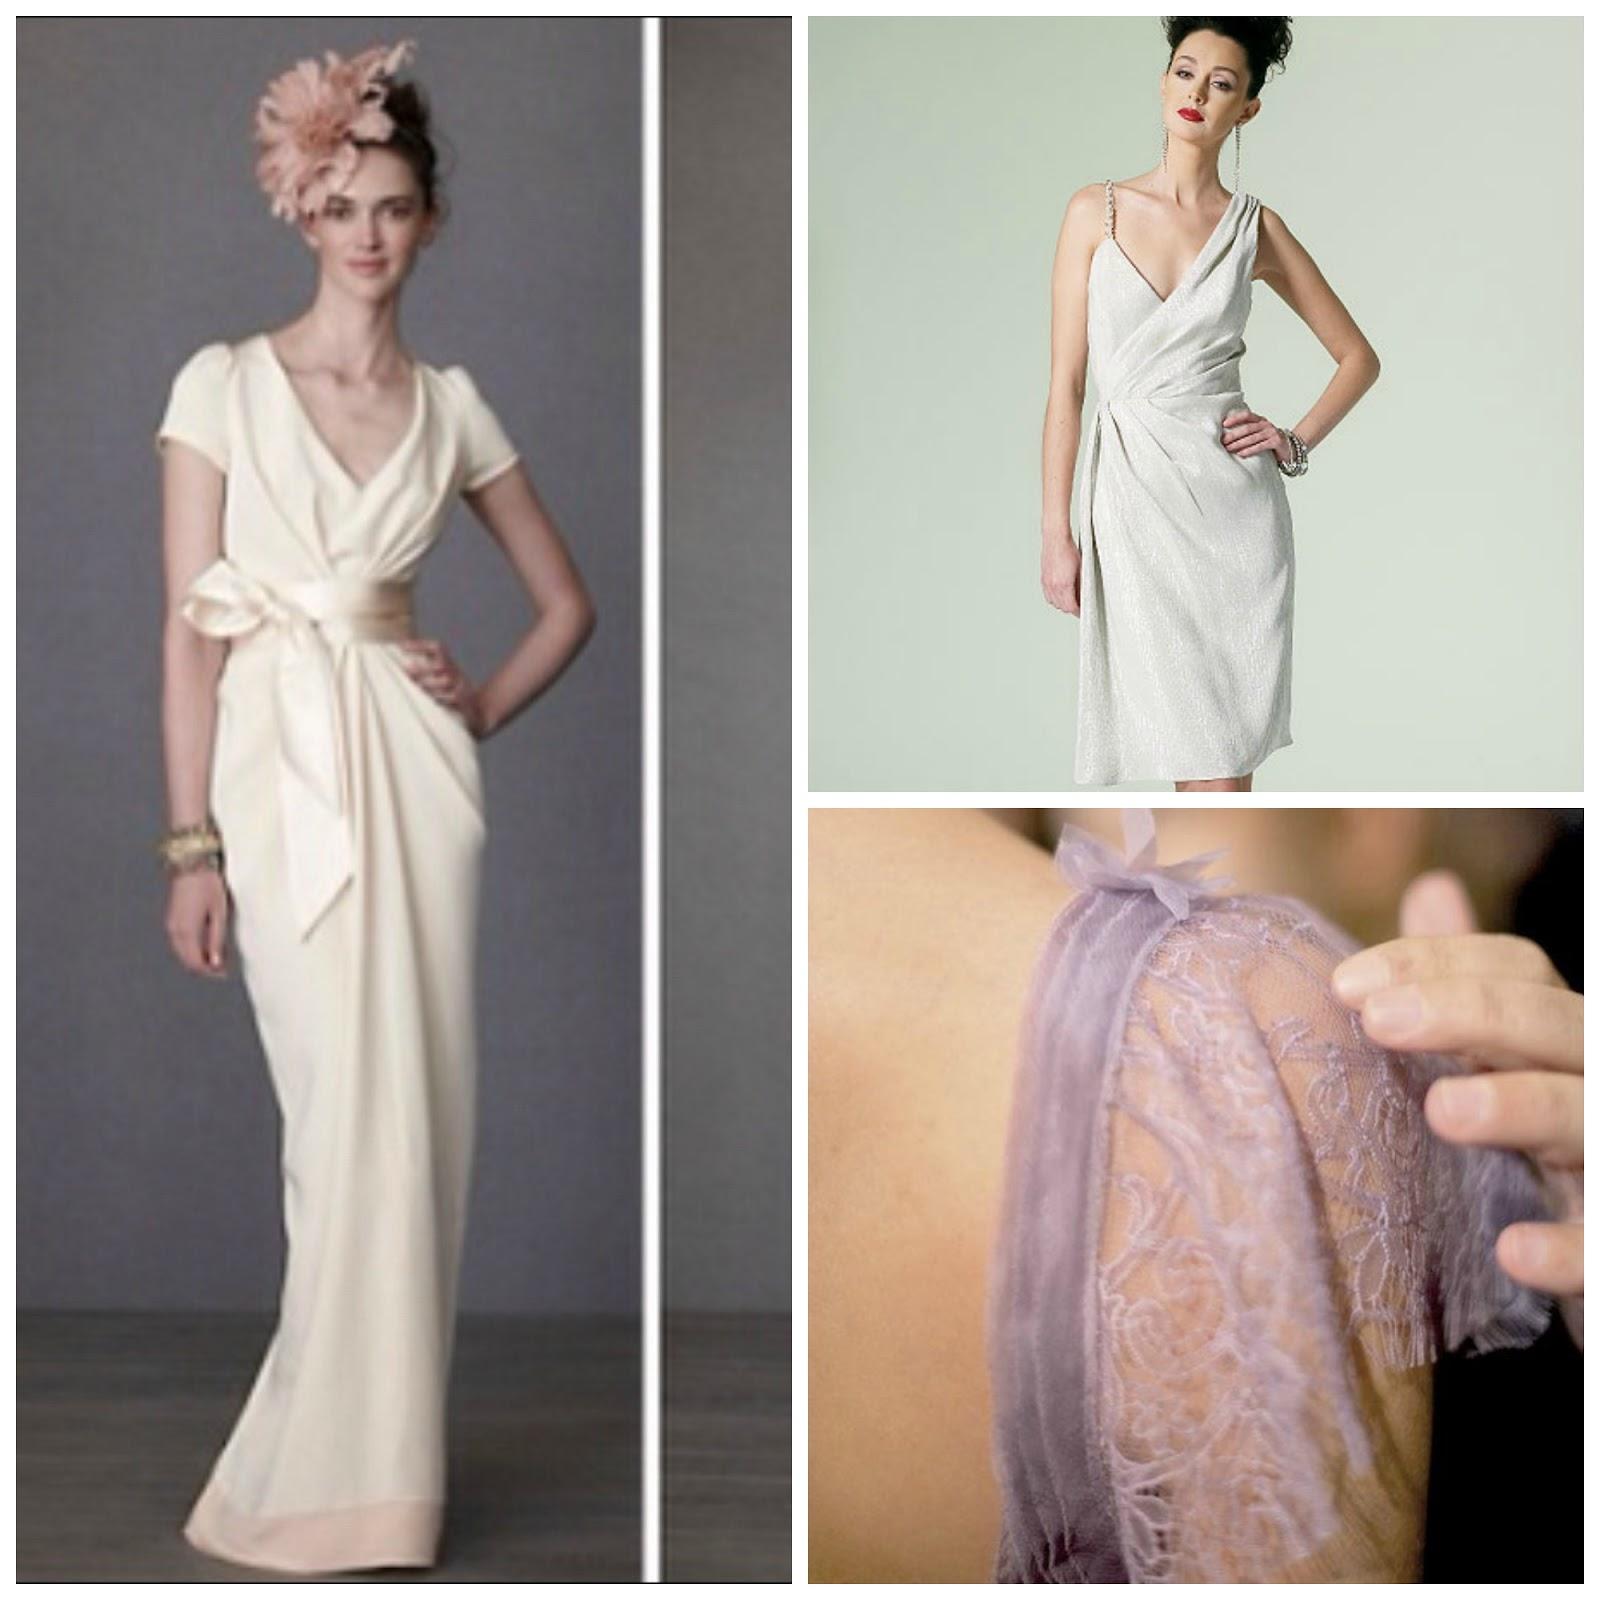 Make your own wedding dress! | UsefulBox - Make, Sew ...